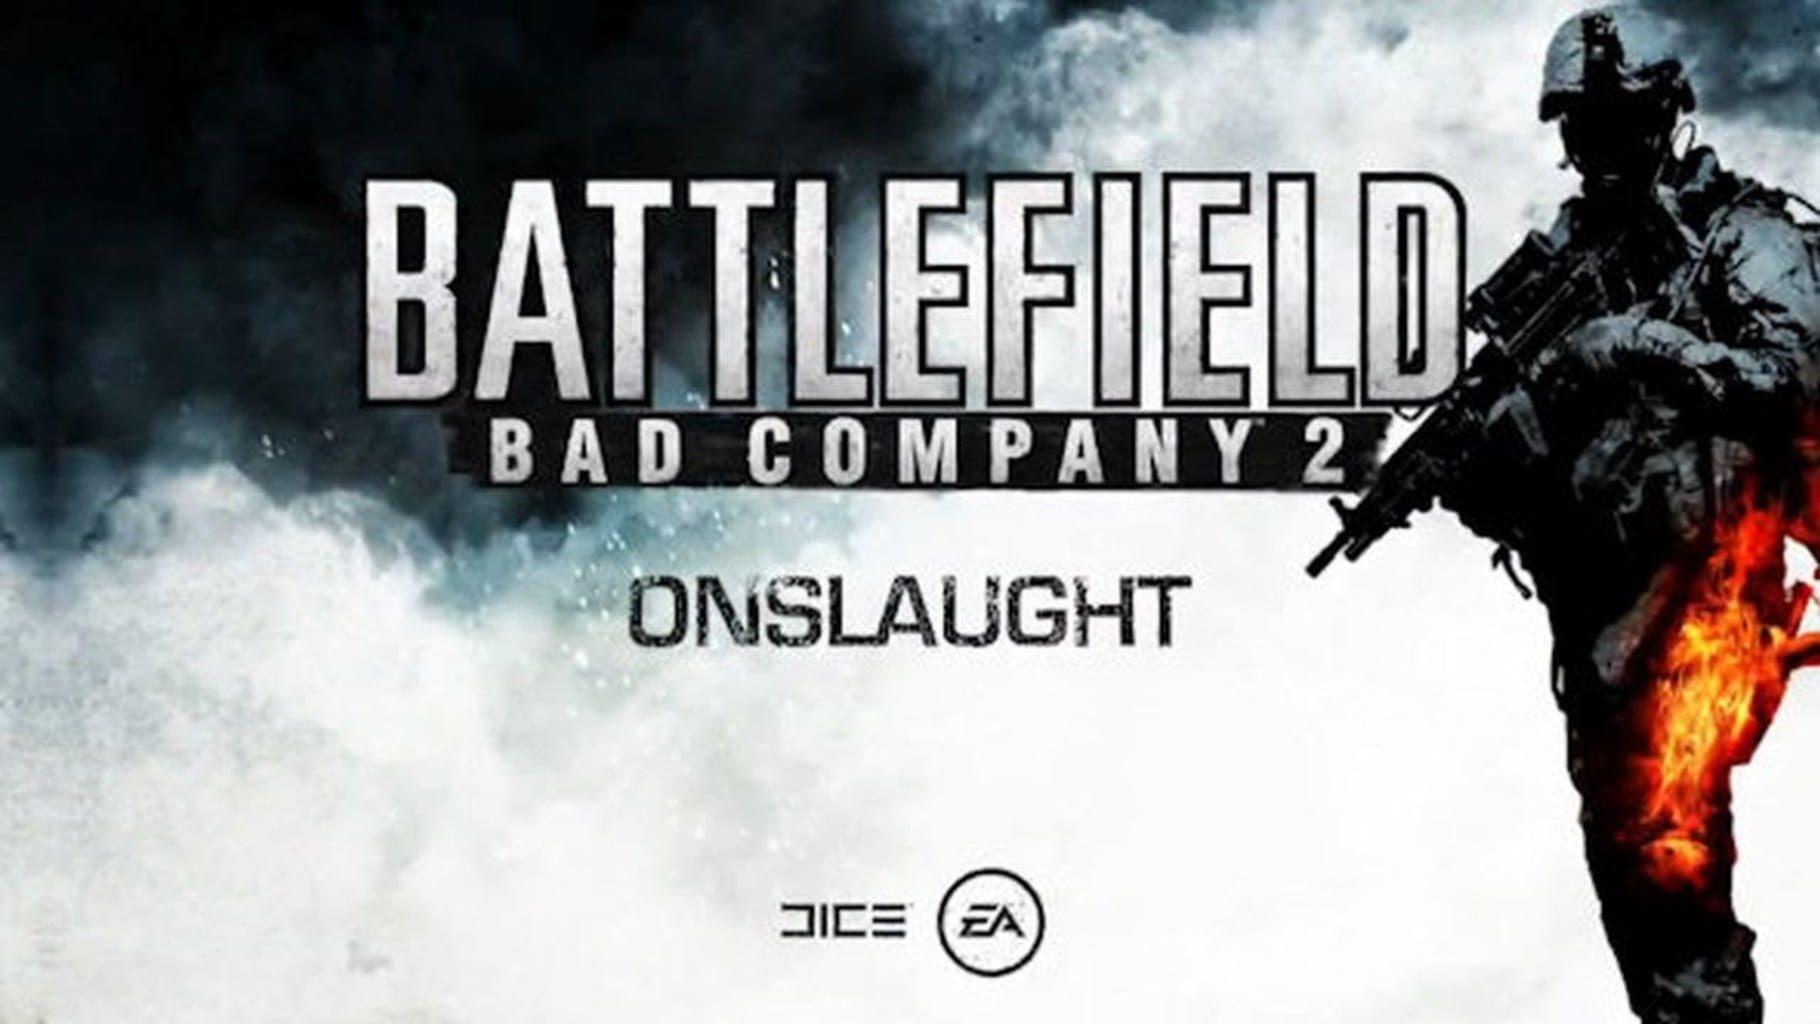 buy Battlefield: Bad Company 2 - Onslaught cd key for all platform